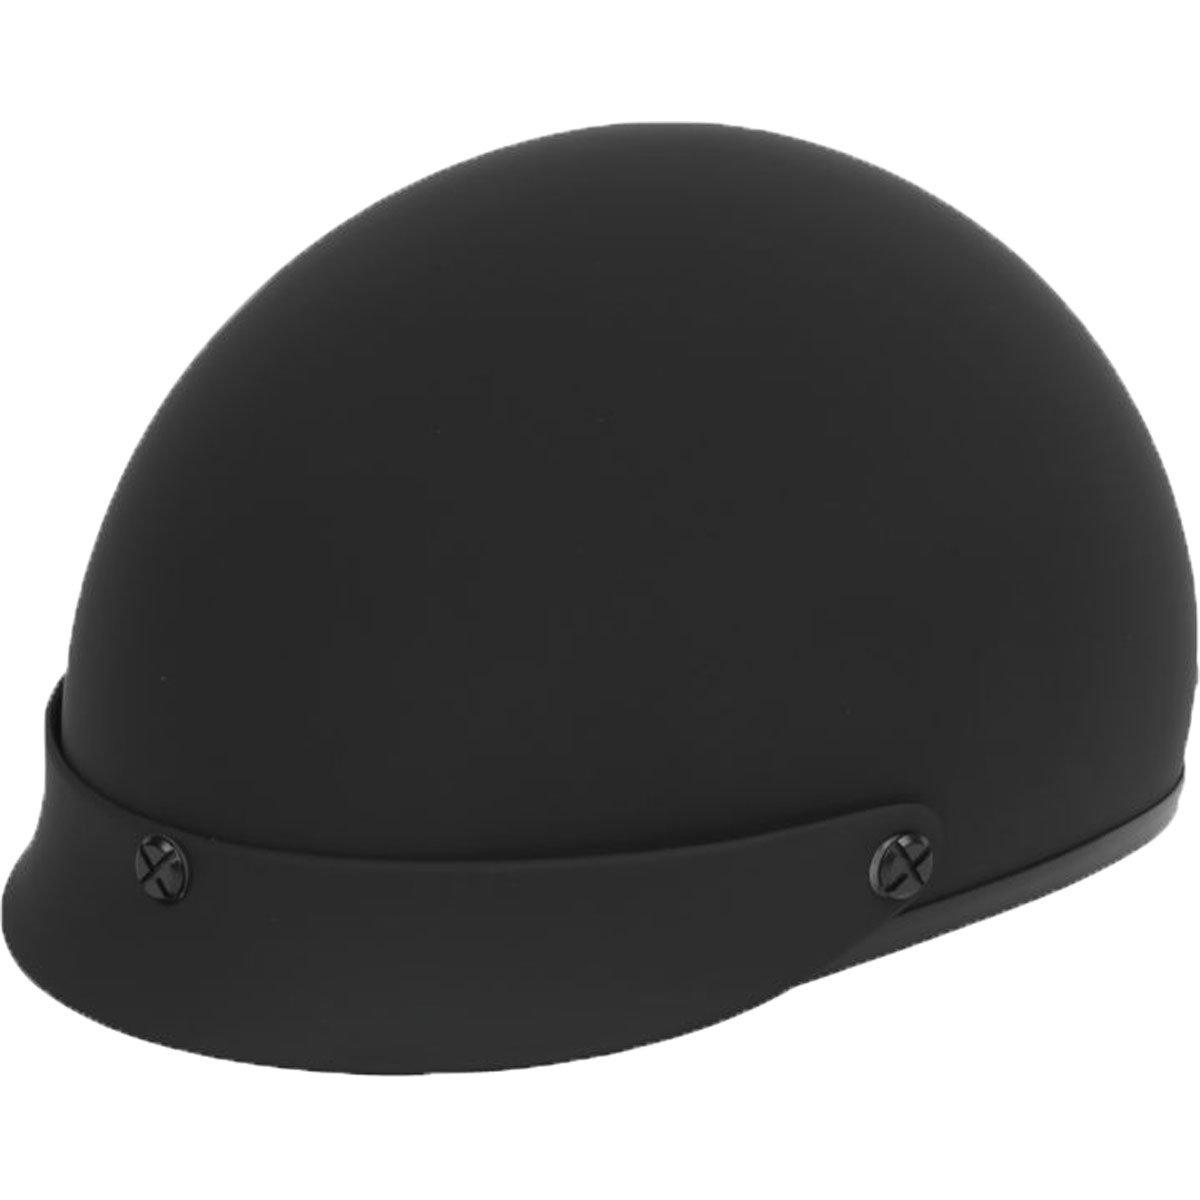 Black Brand Cheater.50 Half Street Motorcycle Helmets - Matte Black/White / Medium